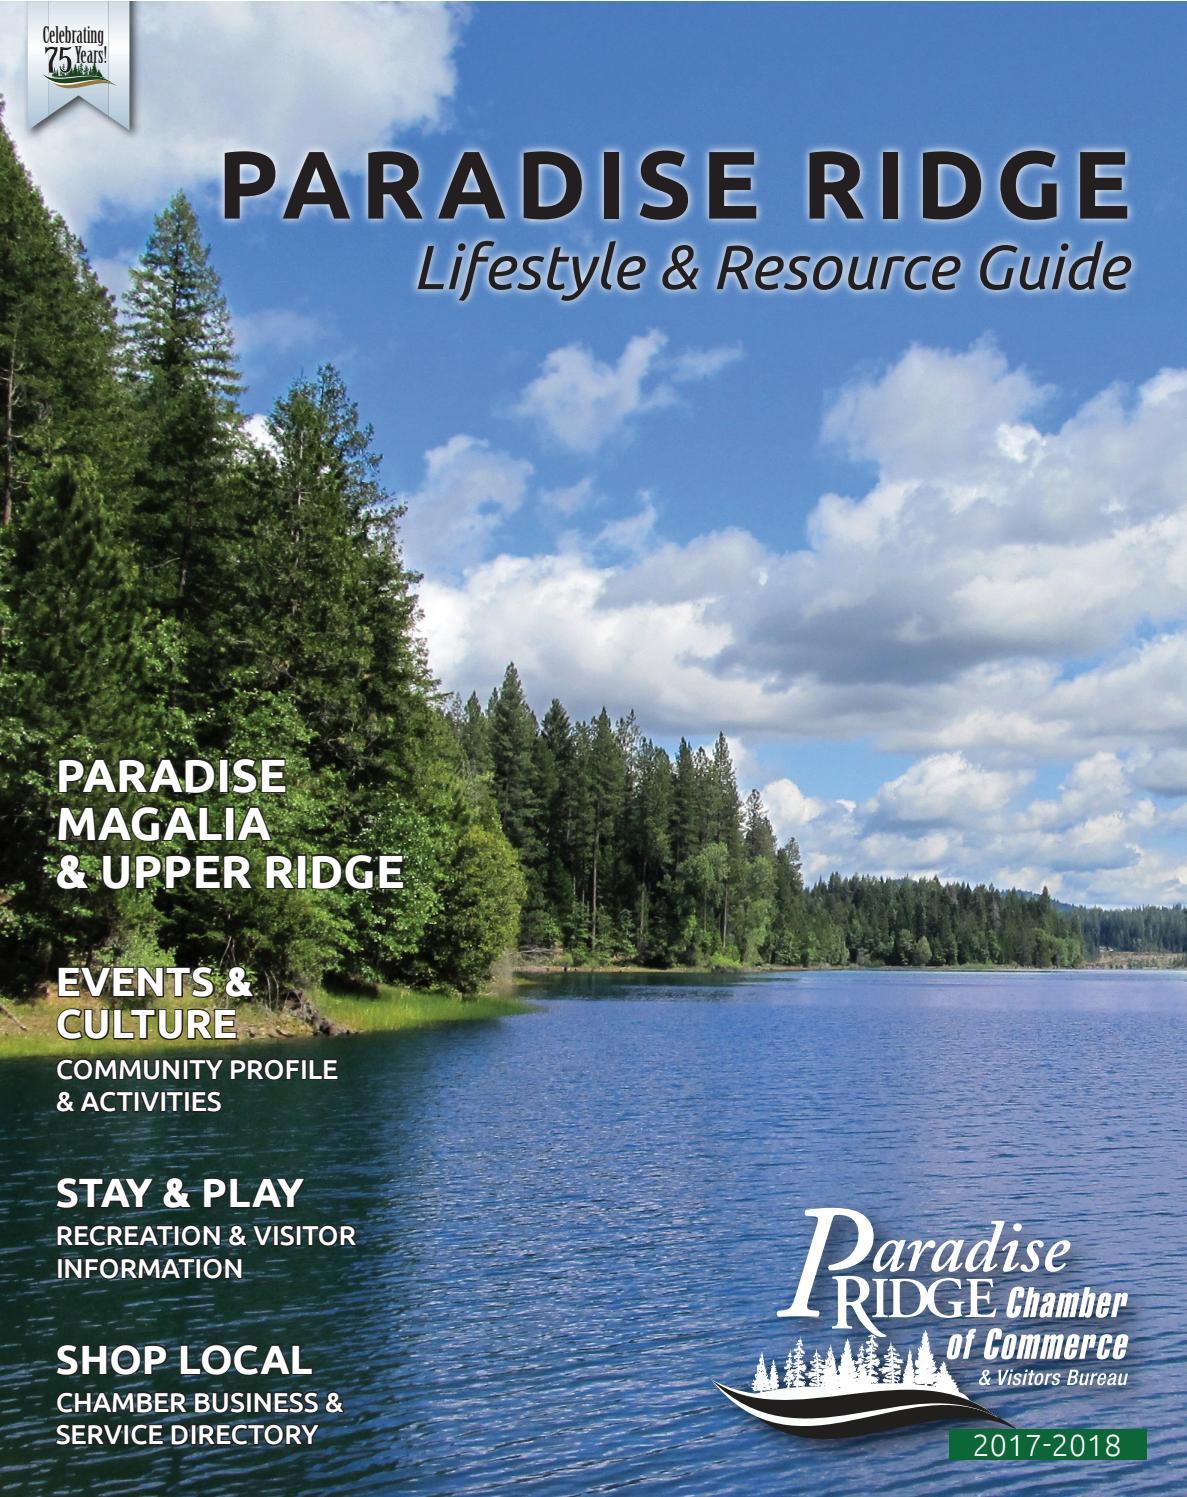 Prlg web2final by Paradise Ridge Business Journal - issuu